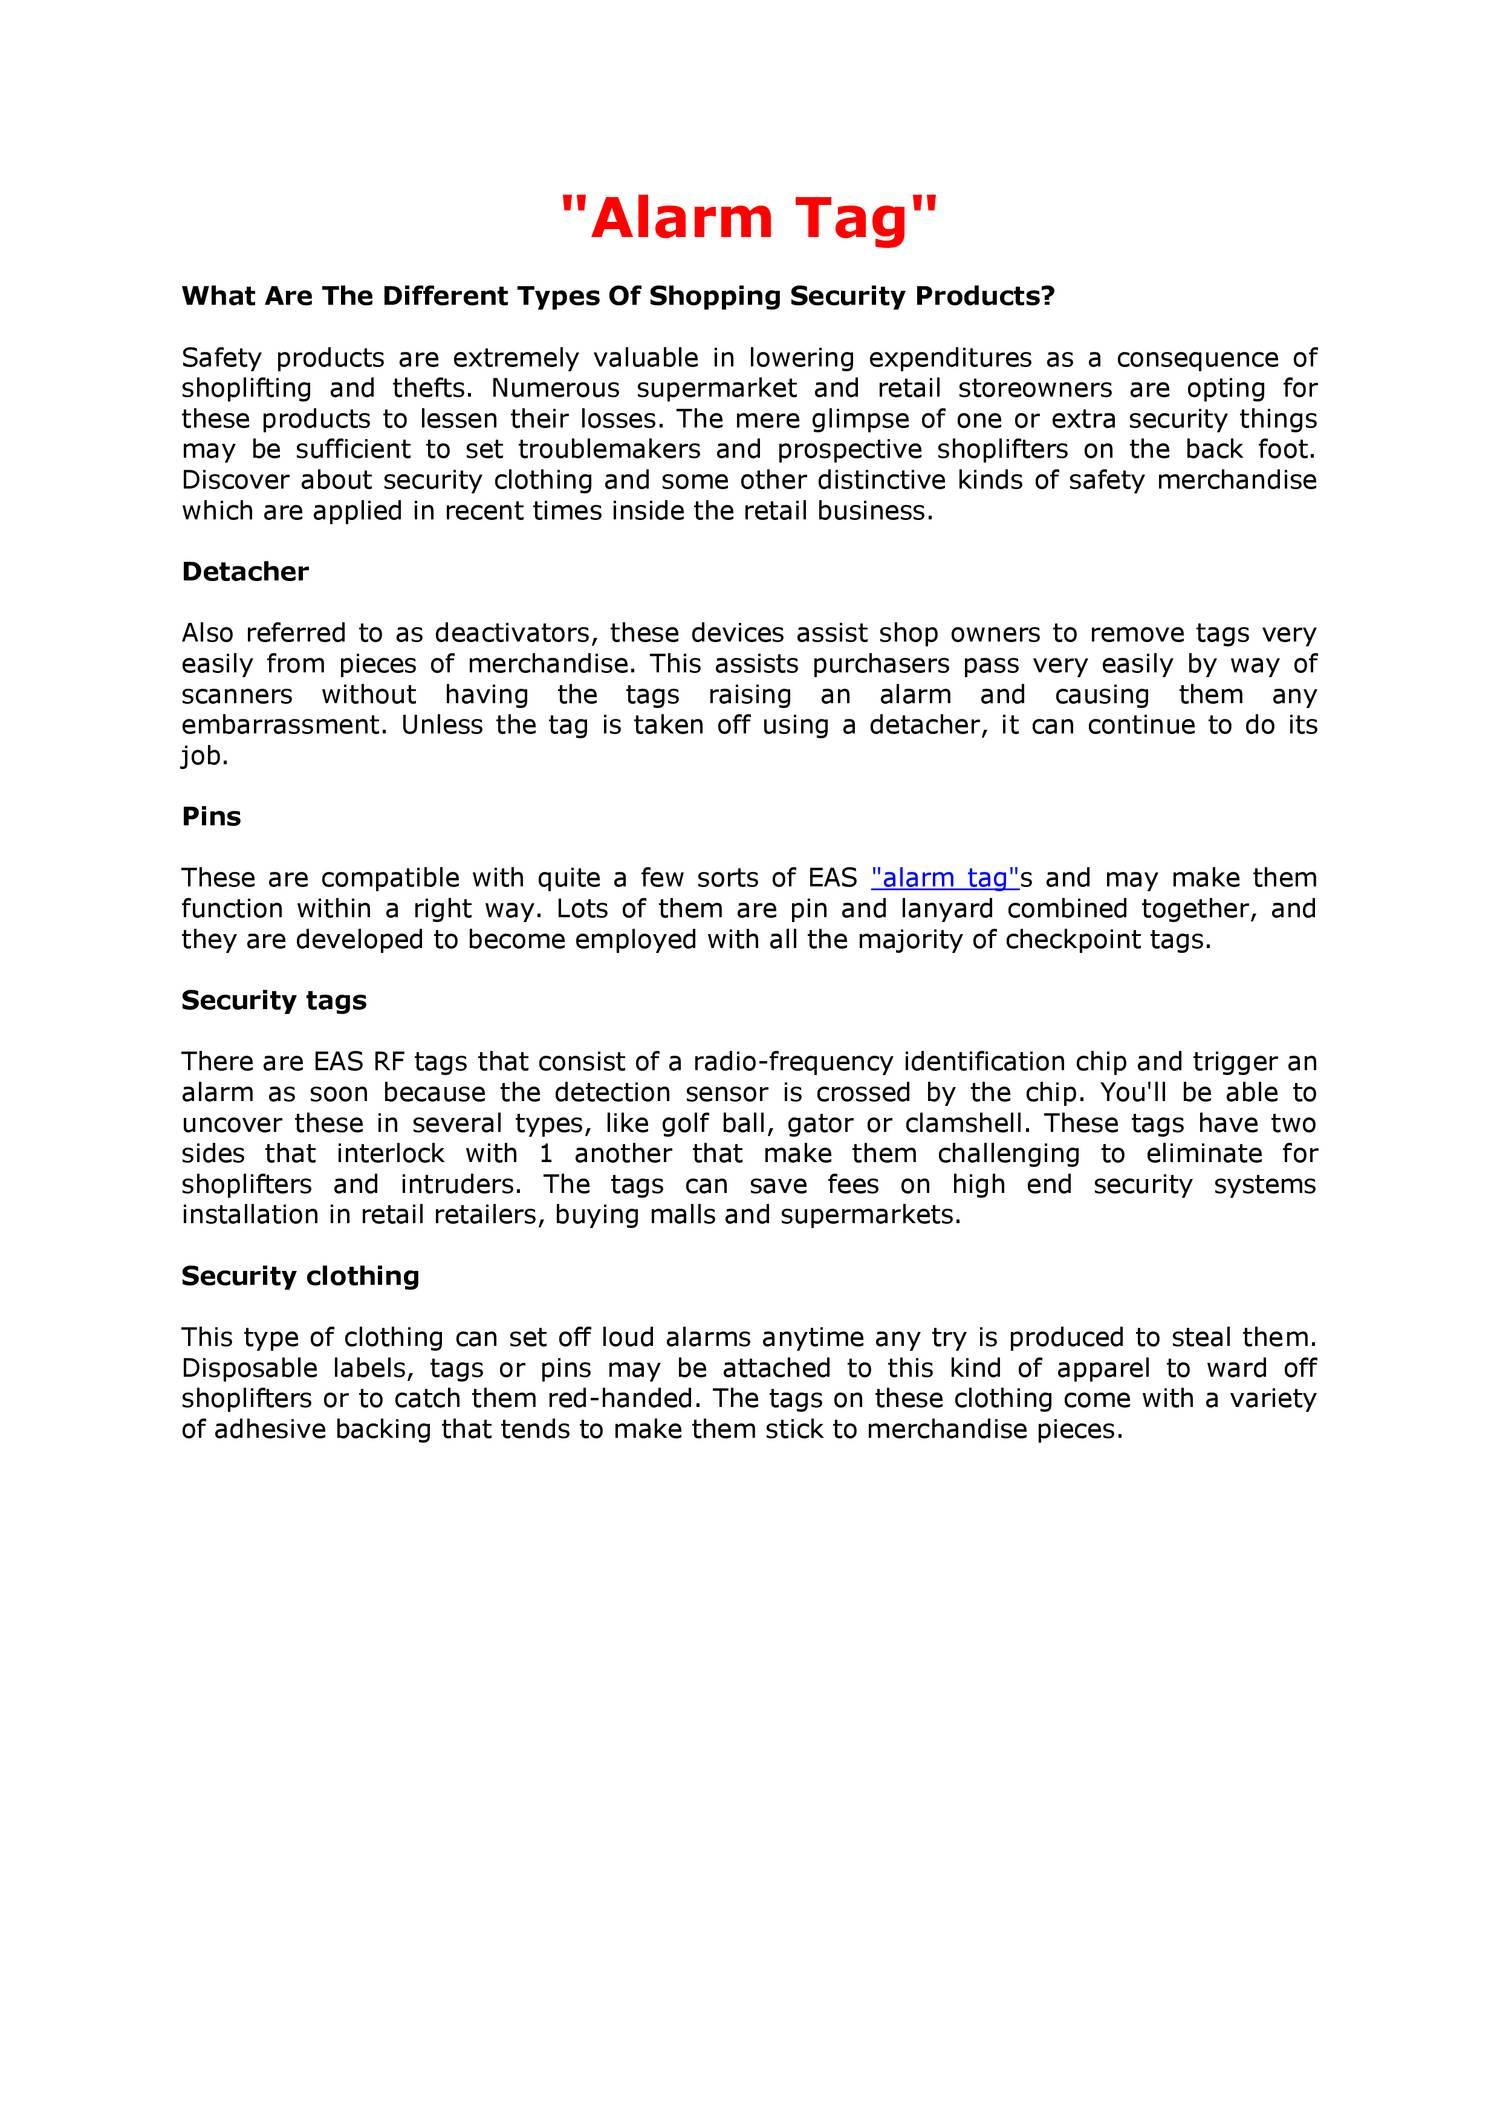 Alarm Tag pdf | DocDroid